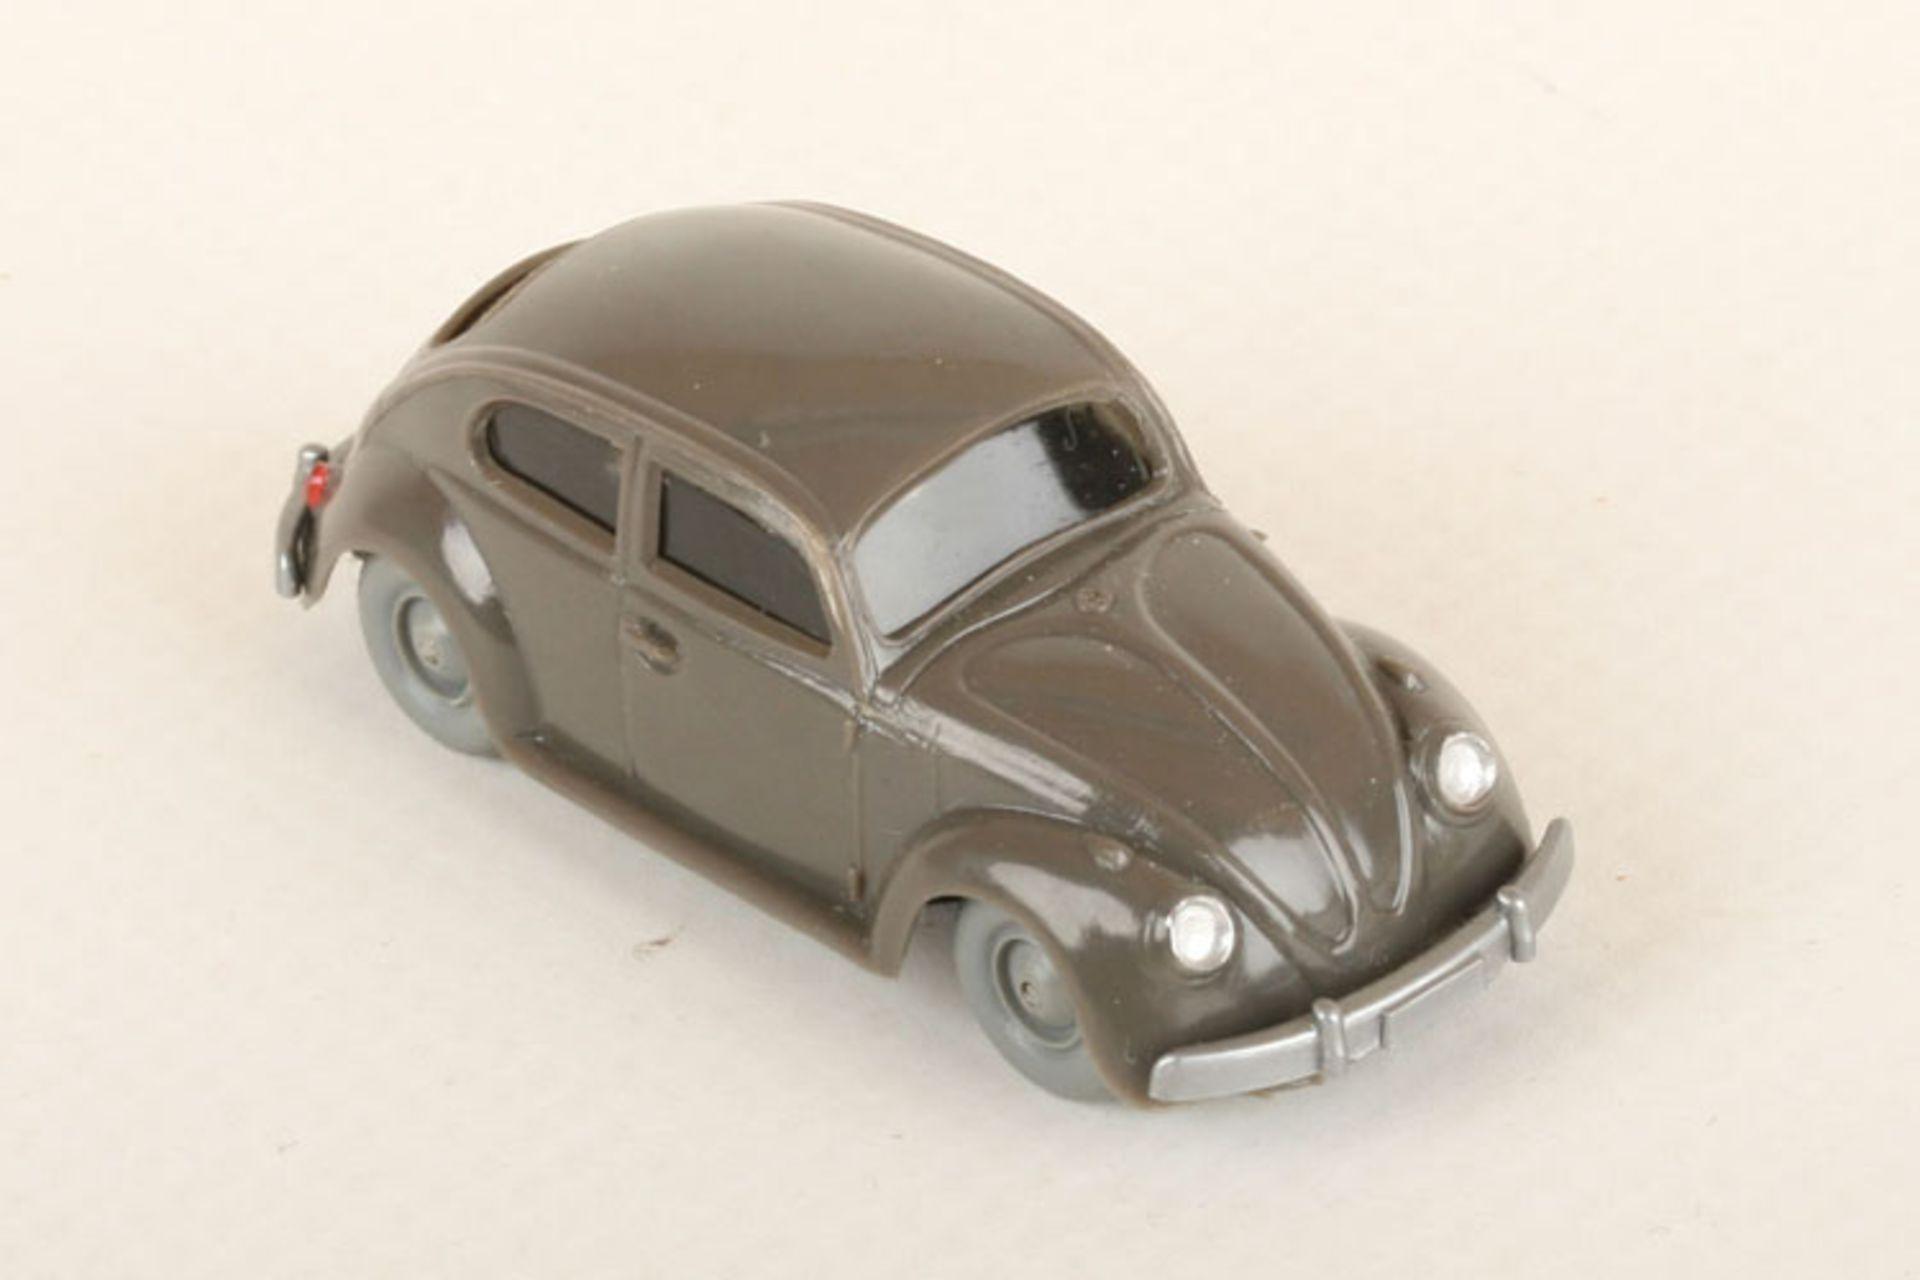 Los 1004 - Wiking VW Käfer Export umbragrau 30/7b, sehr gut bis neuwertig